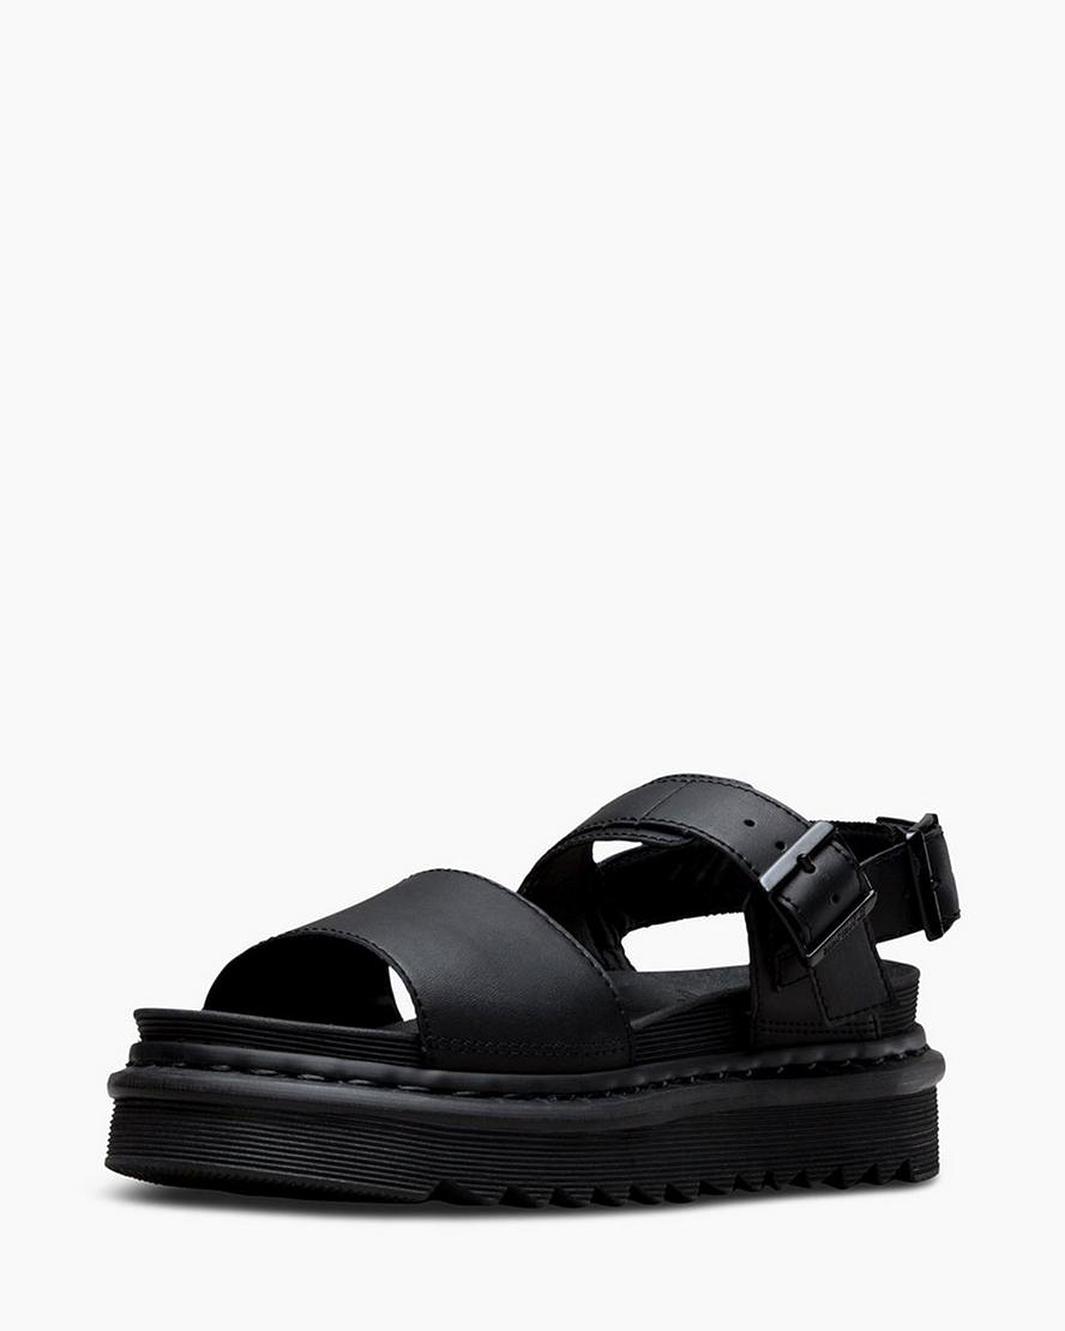 doc martens sandals for sale